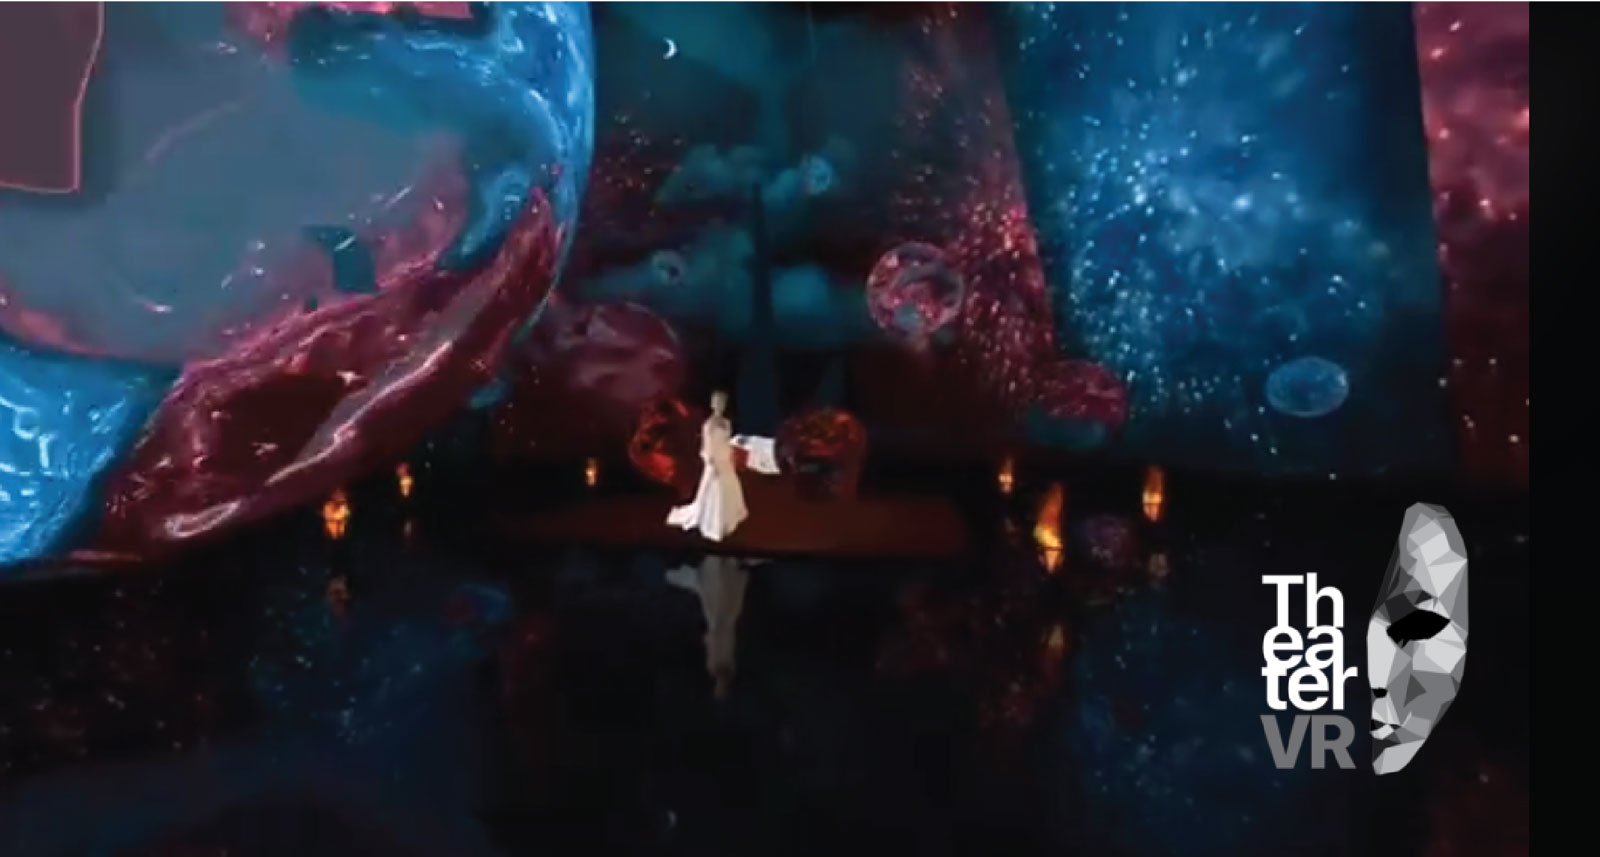 A woman in a white dress dancing in a virtual landscape.